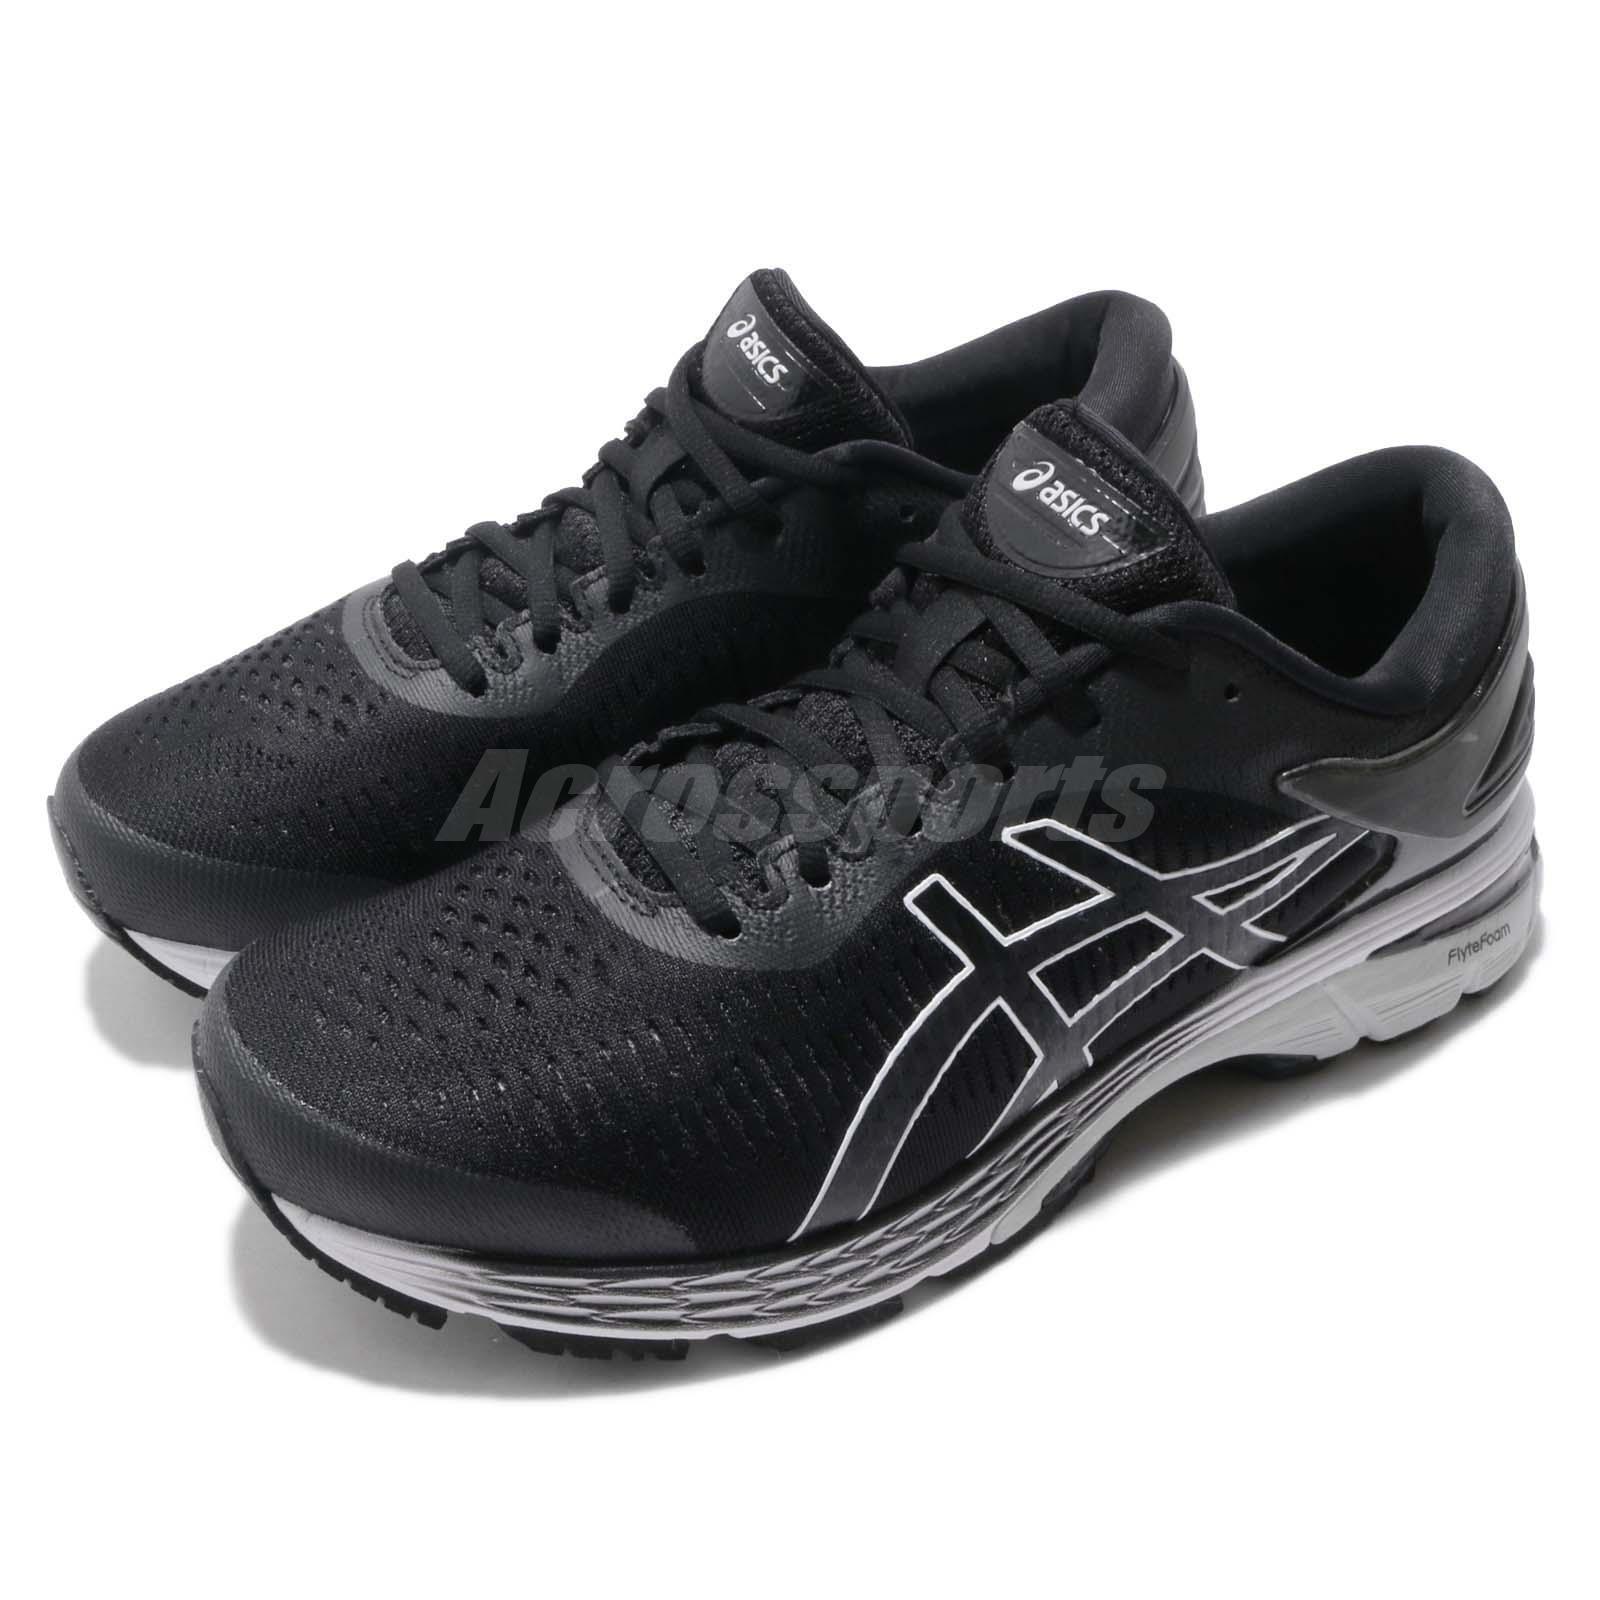 Asics Gel Kayano 25 2E Wide nero grigio  Men Running scarpe scarpe da ginnastica 1011A029 -003  in cerca di agente di vendita